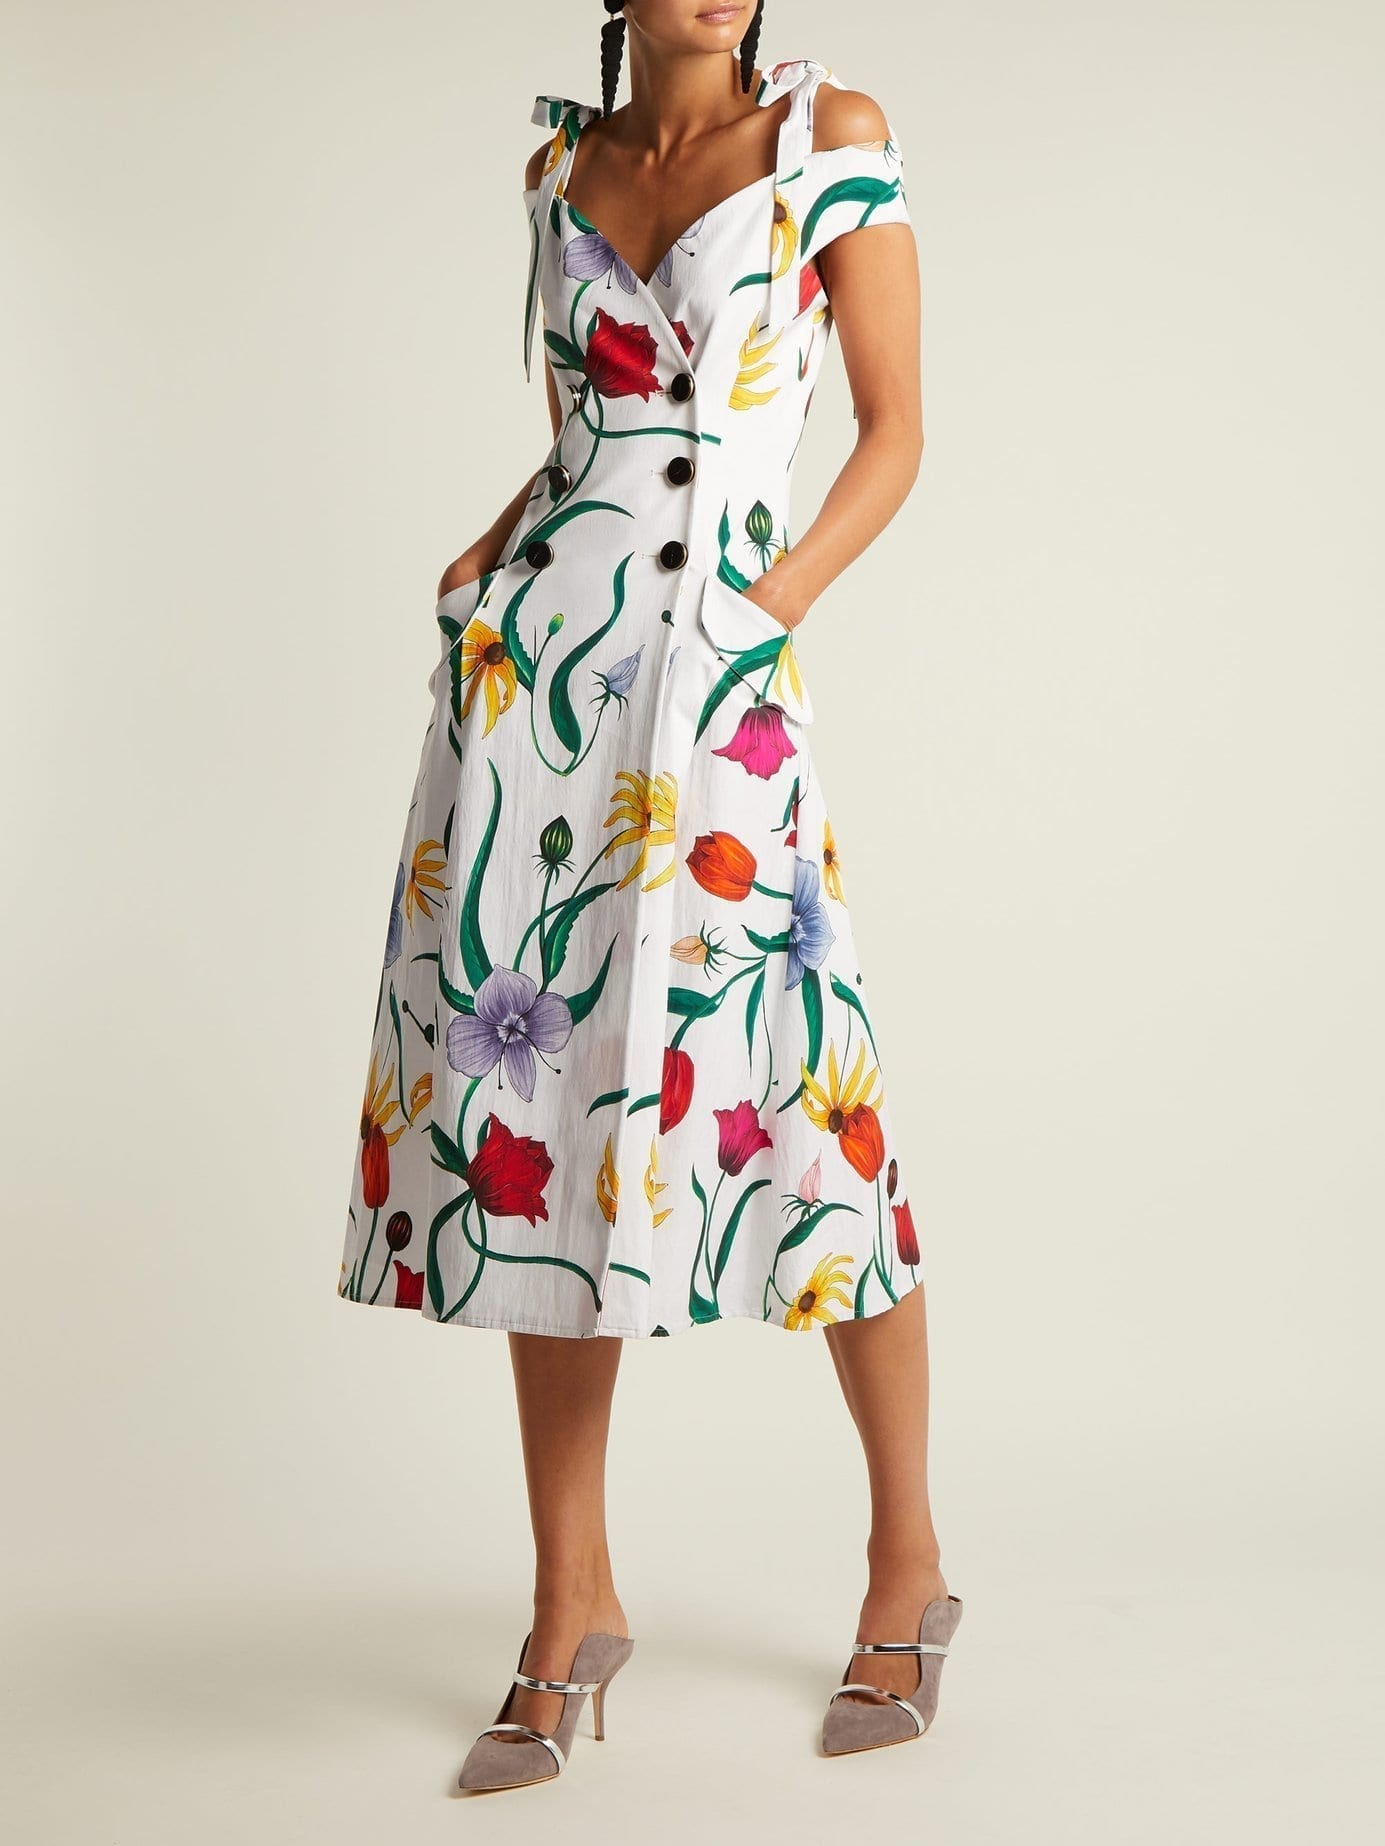 CAROLINA HERRERA Cotton Blend Faille White / Floral Printed Dress